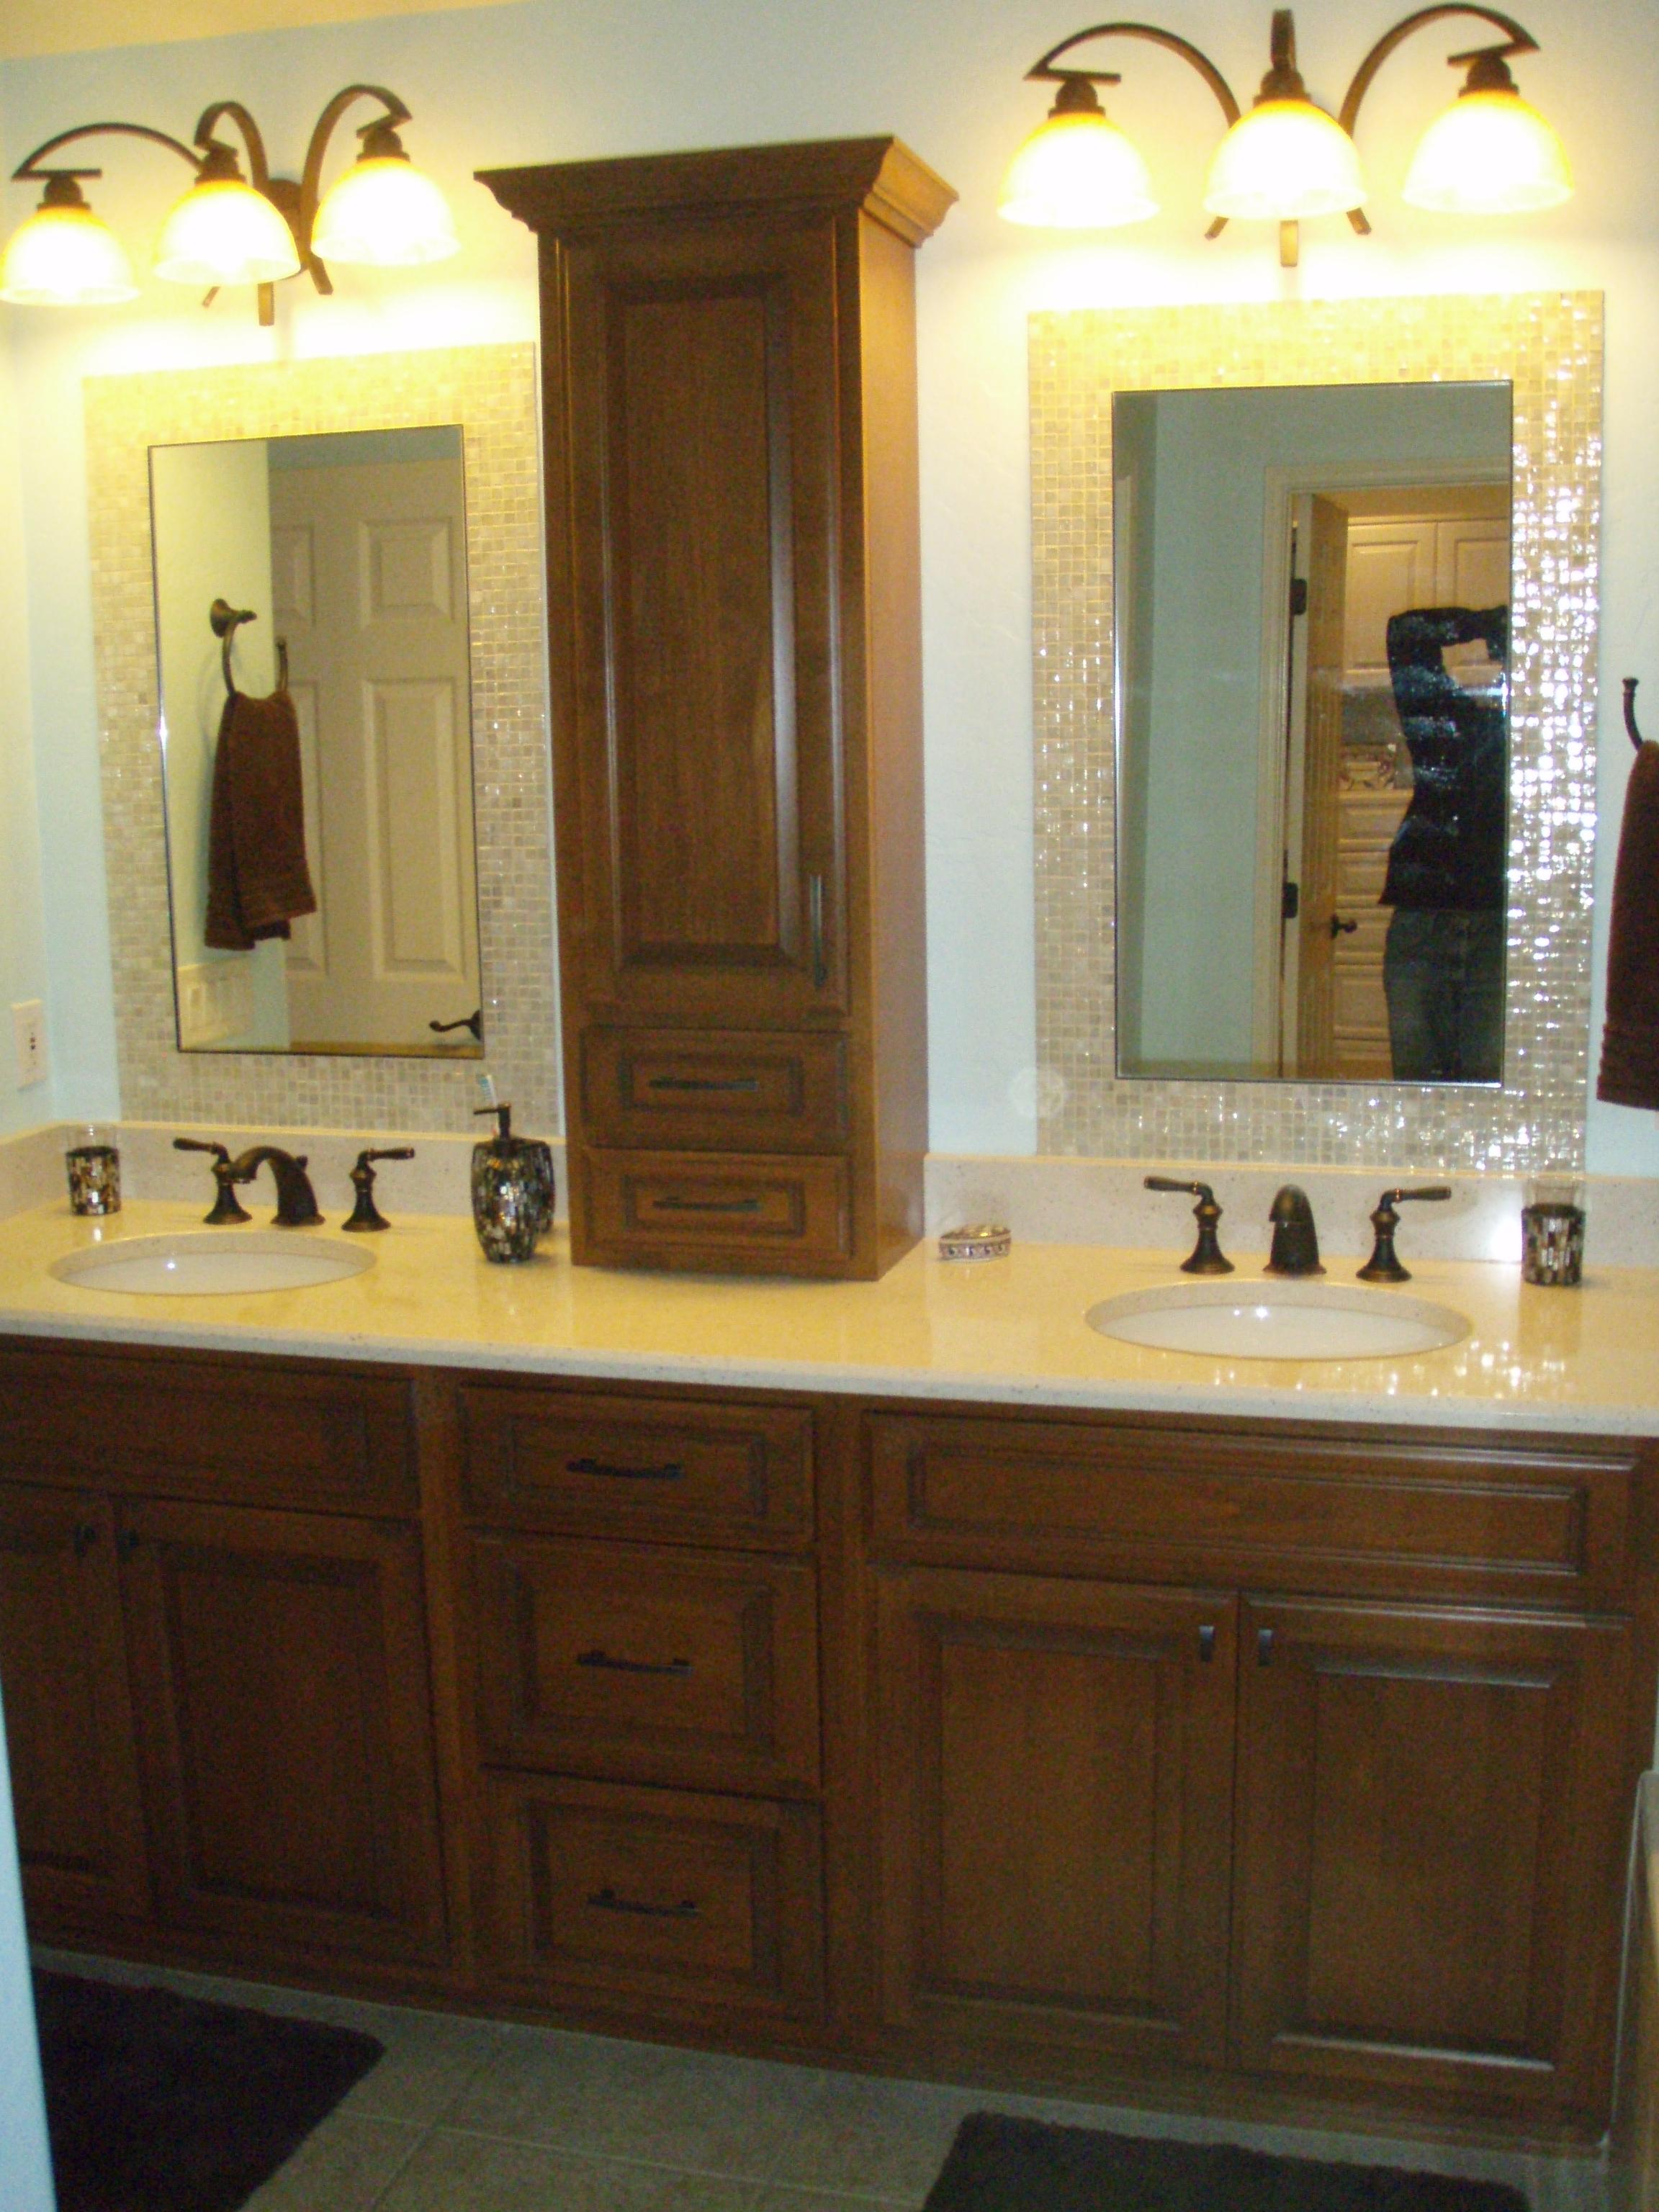 Bathroom Cabinets Tucson Az laundry & bath storage cabinets tucson | storage shelvescloset